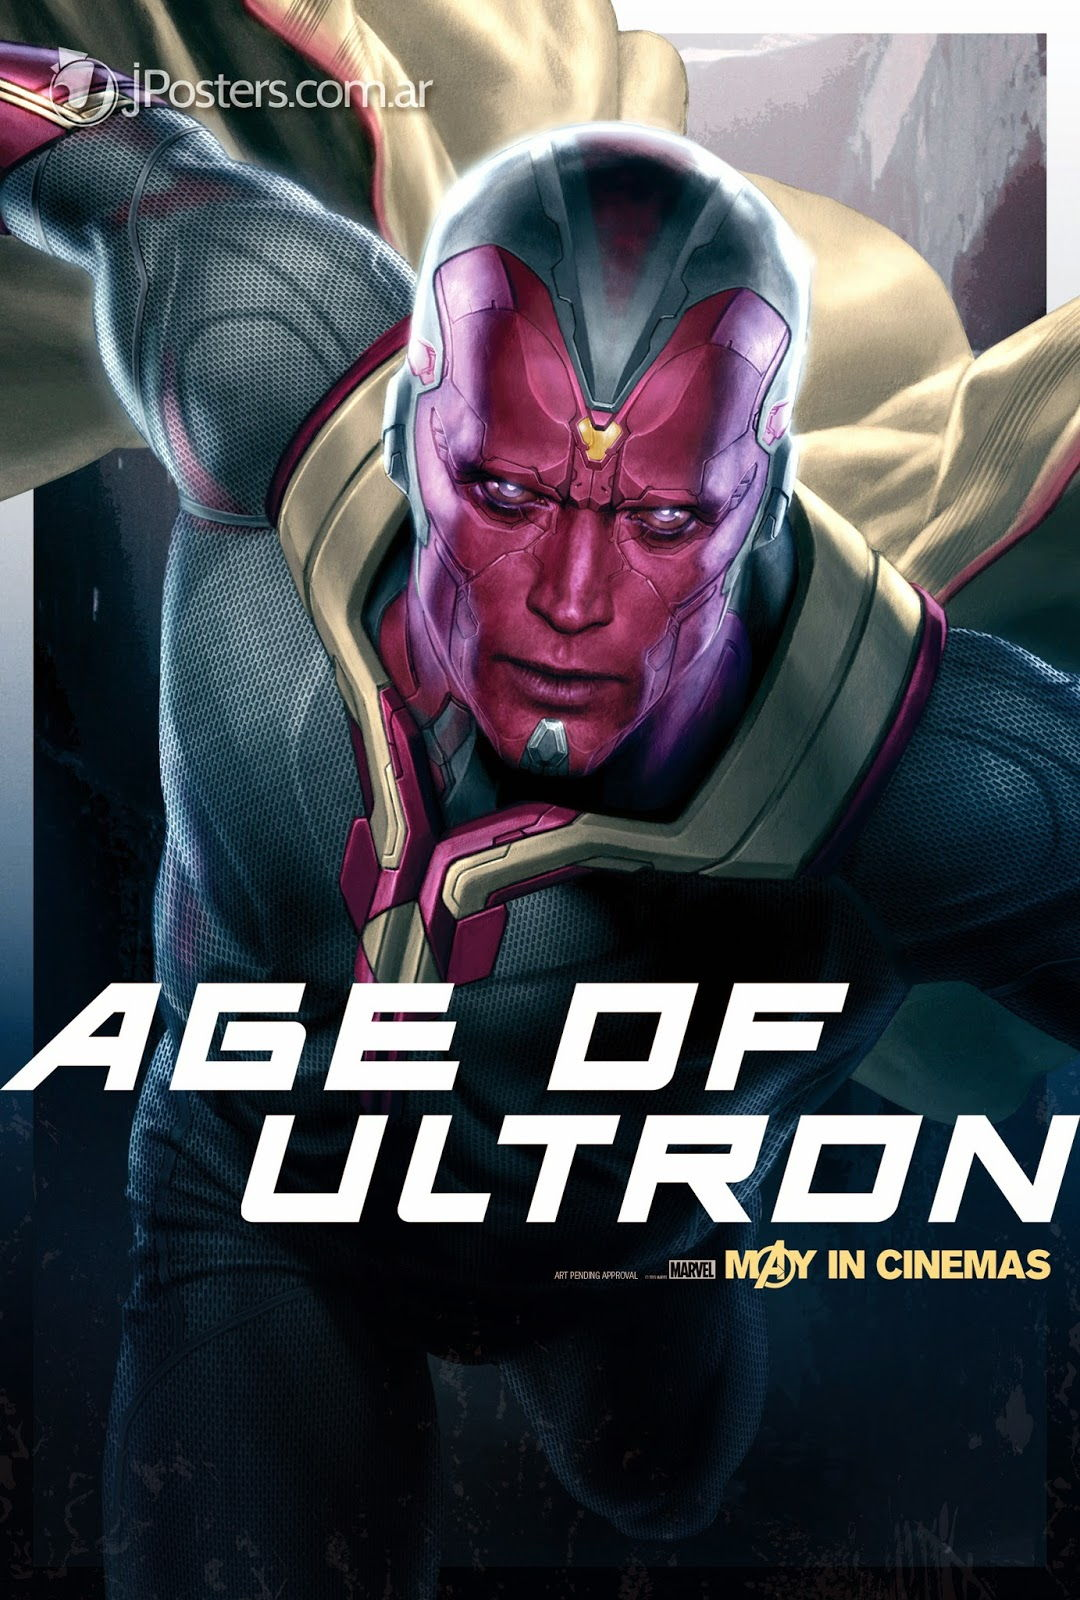 The vision dans Avengers 2